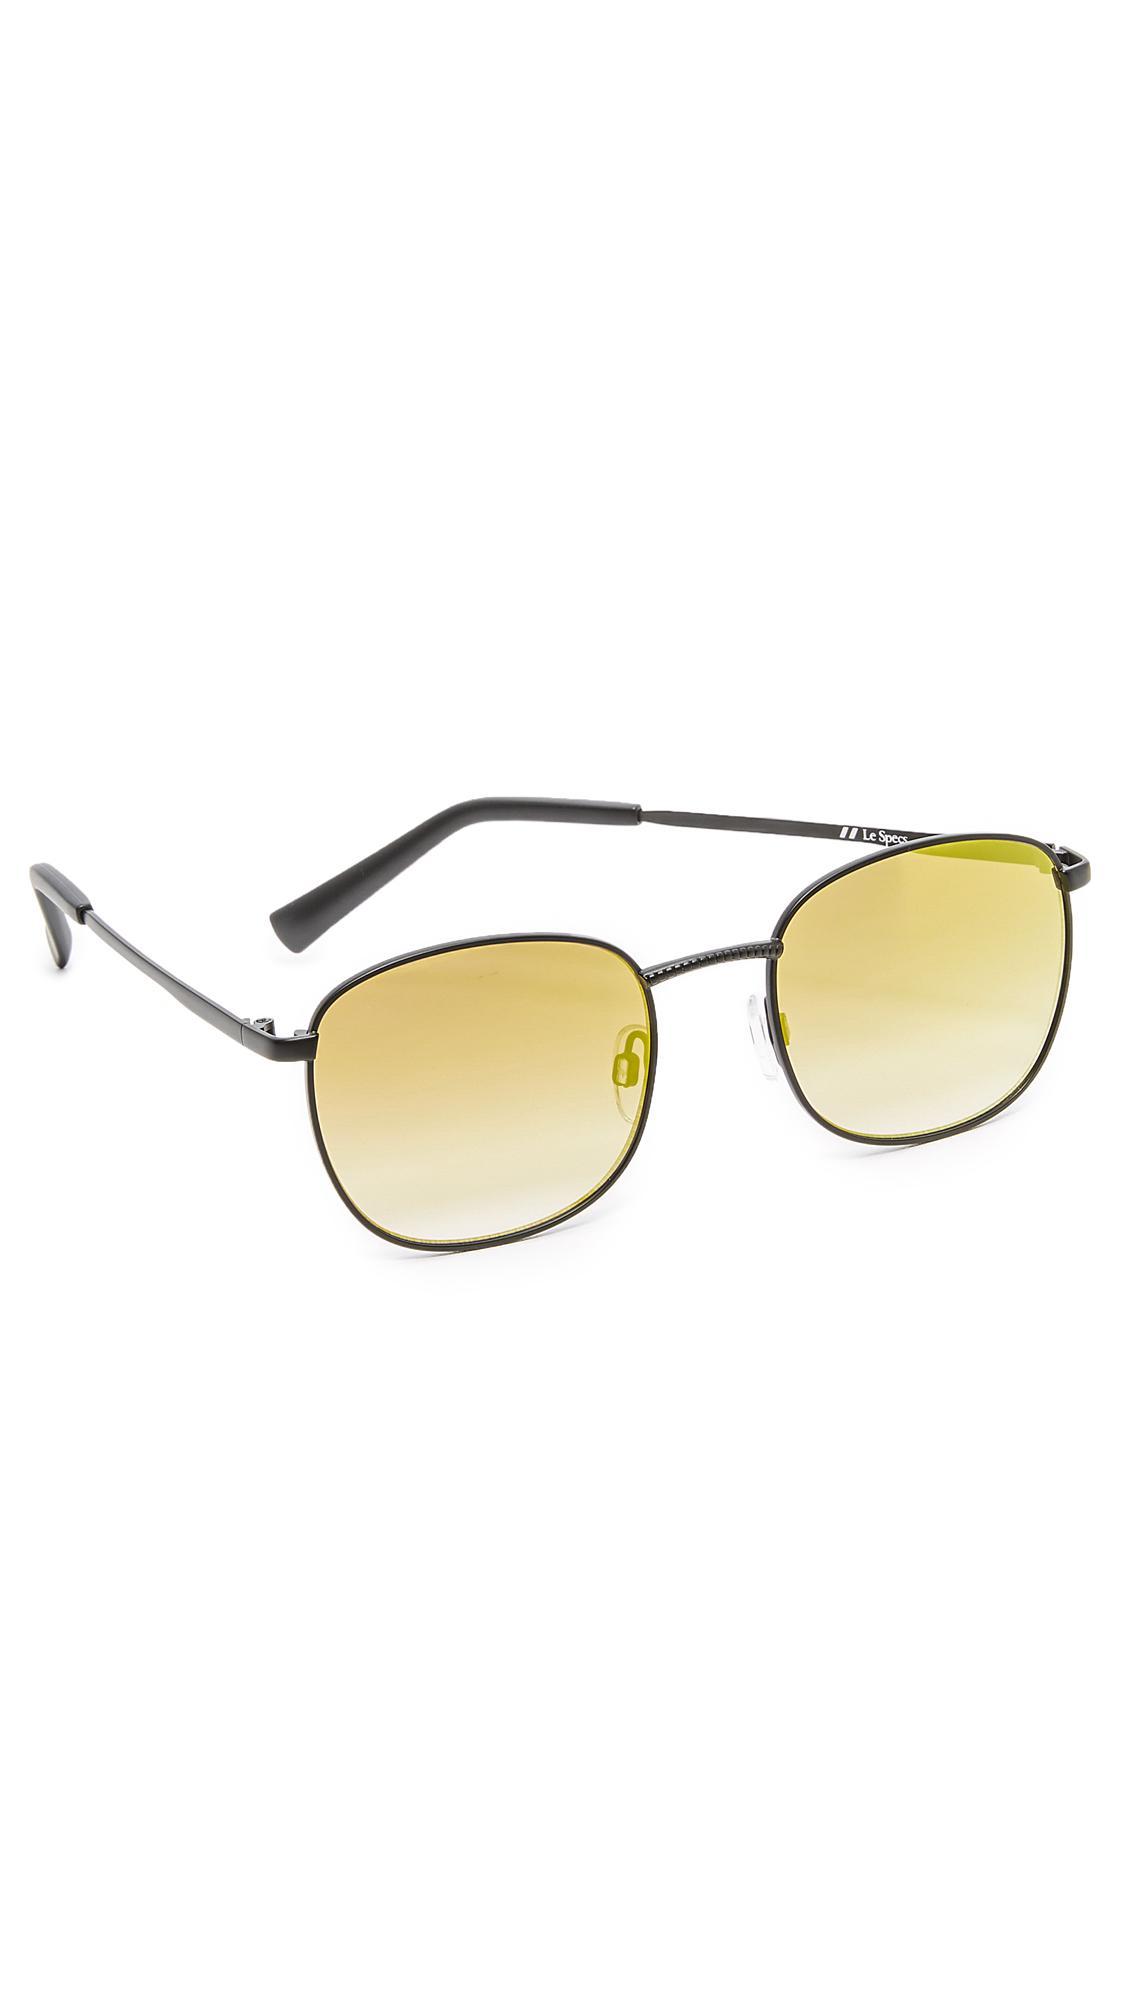 cfd8f97c30 Le Specs Neptune Sunglasses for Men - Lyst